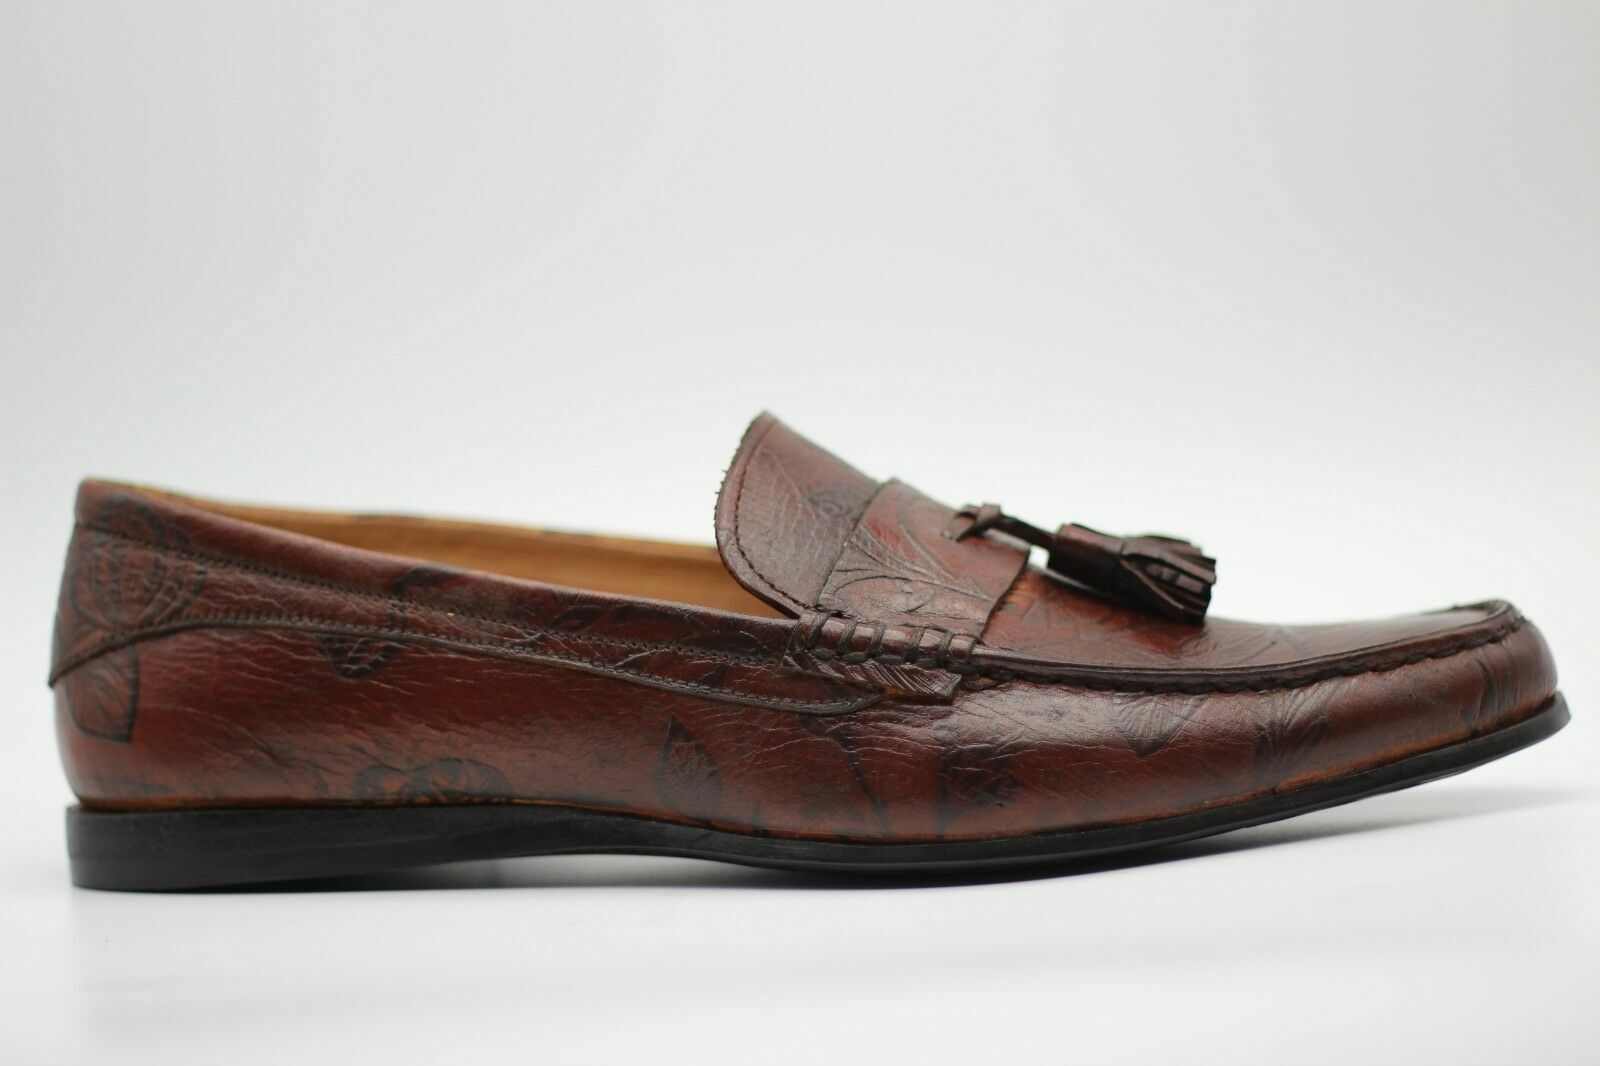 Handgemachte braune bedruckte Leder Quasten Mokassin formale Slip Ons Schuhe